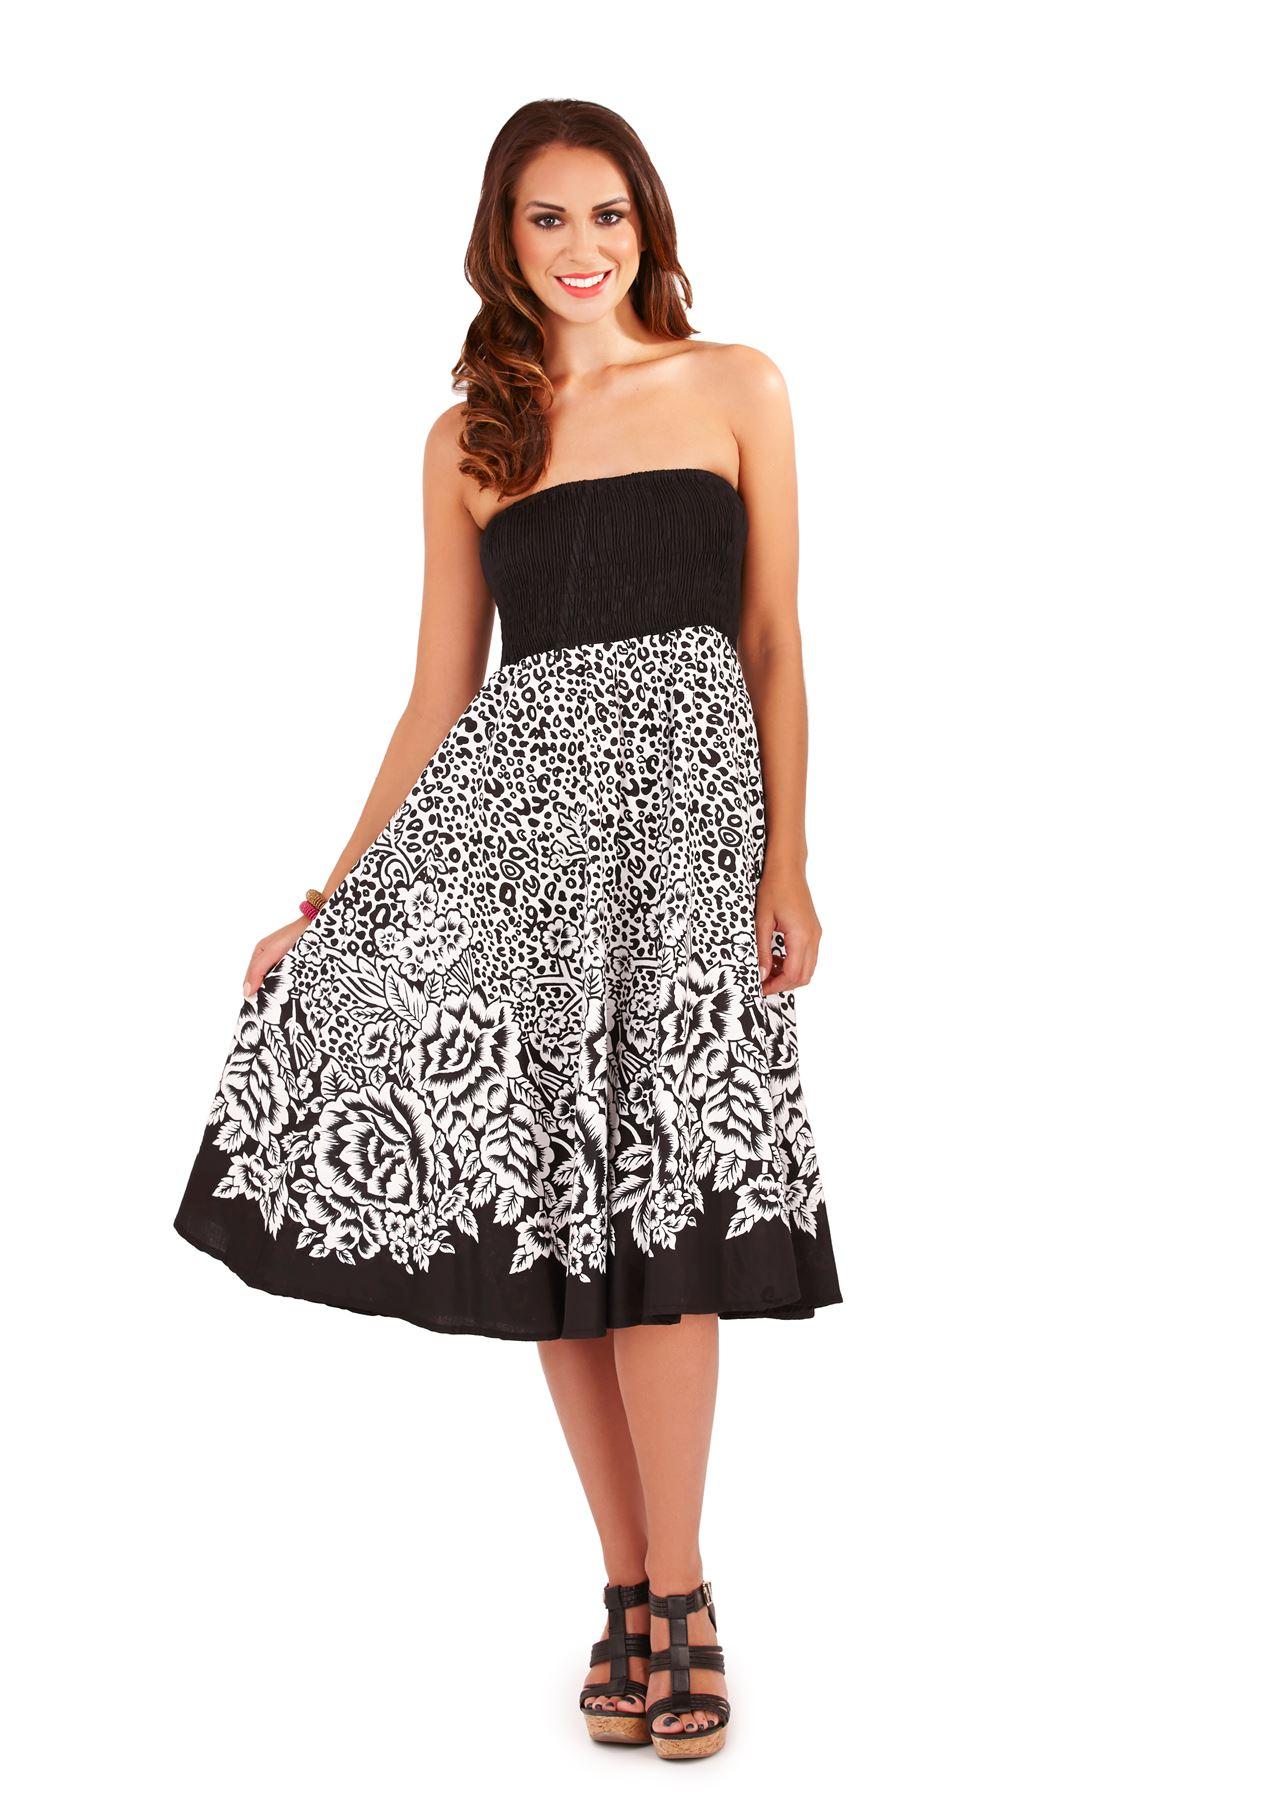 Womens Dress Summer Beach Wear Skirt Holiday Casual Ladies Dresses ...